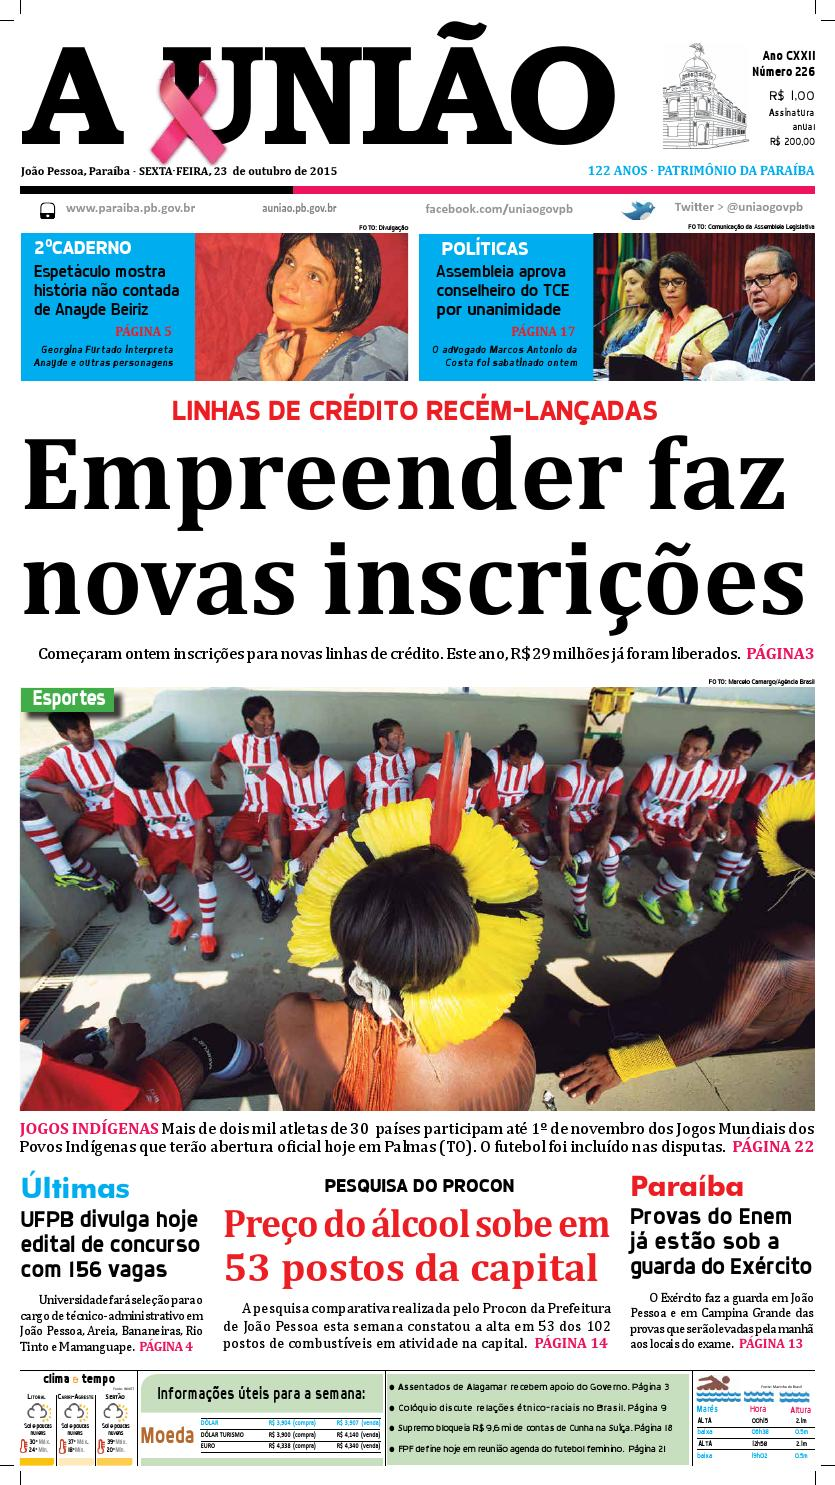 Jornal A União - 23 10 2015 by Jornal A União - issuu c94ca157ec9